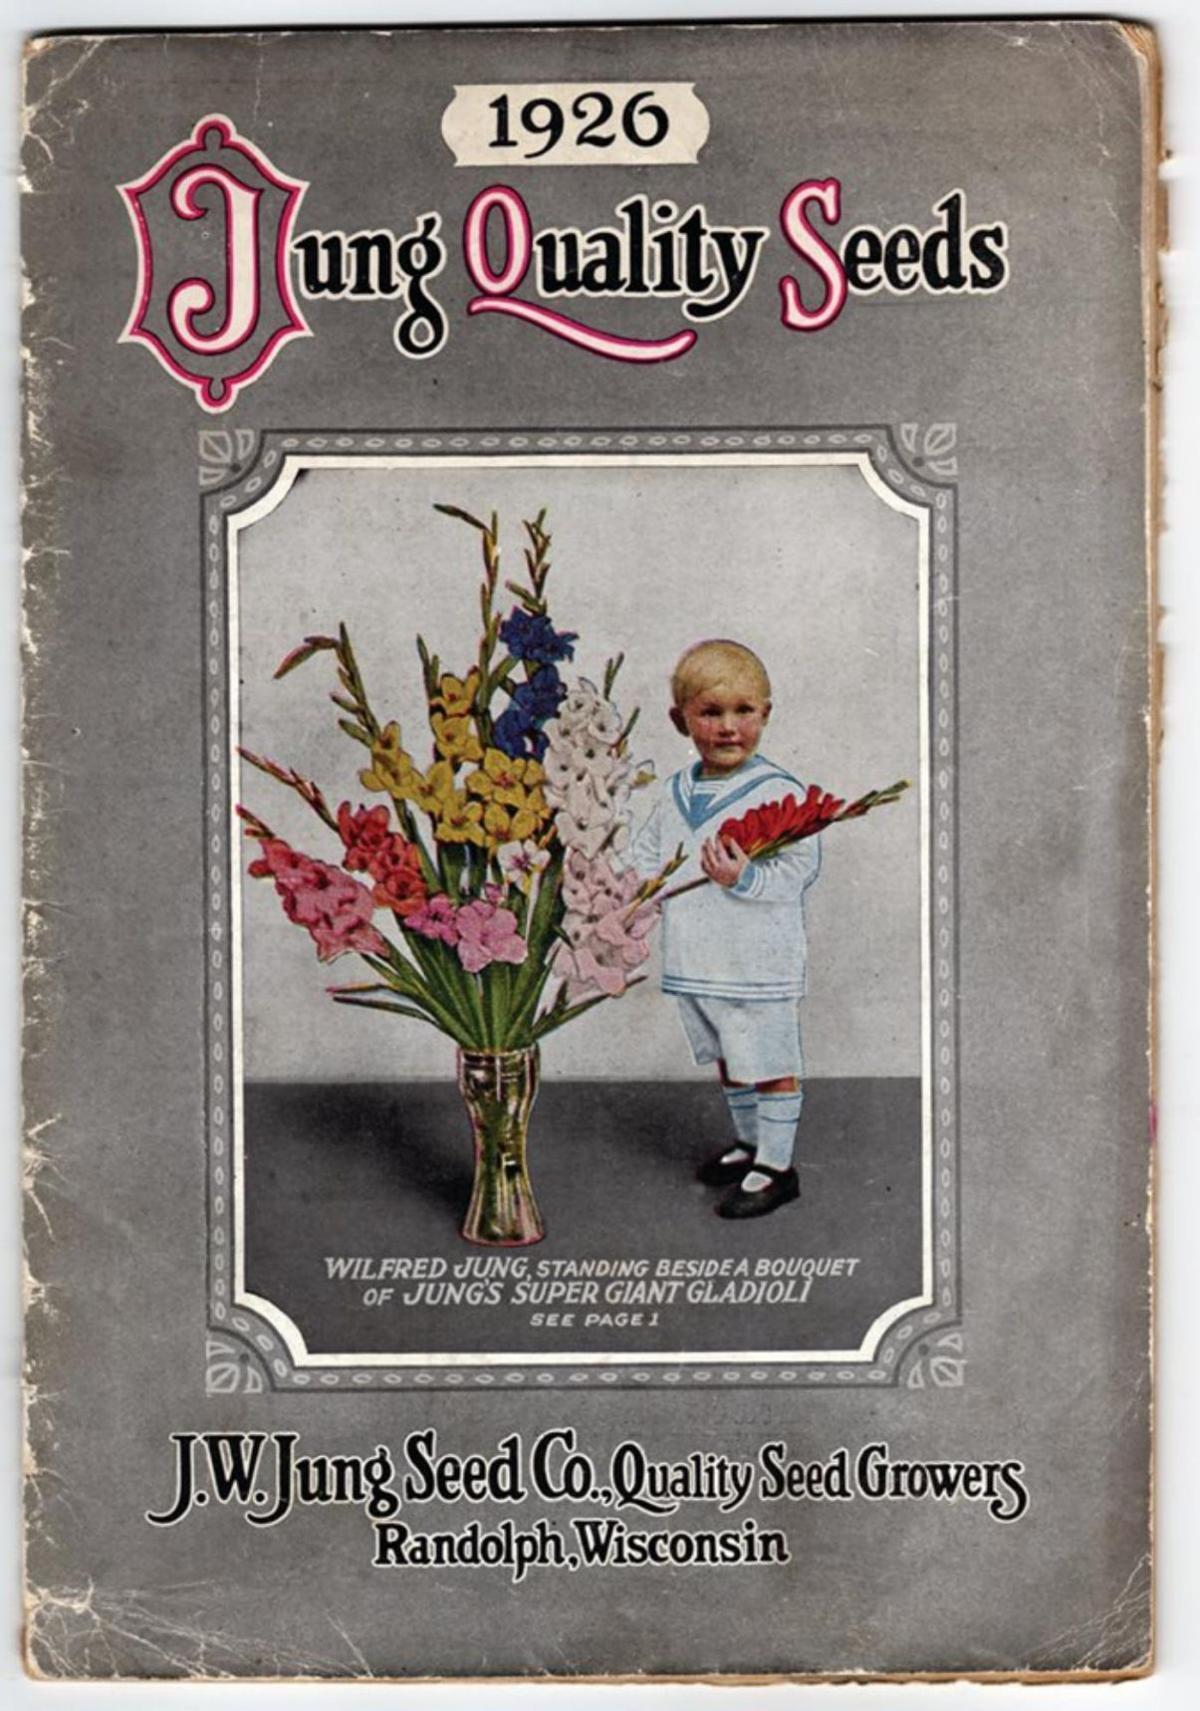 Jung 1926 advertisement.pdf